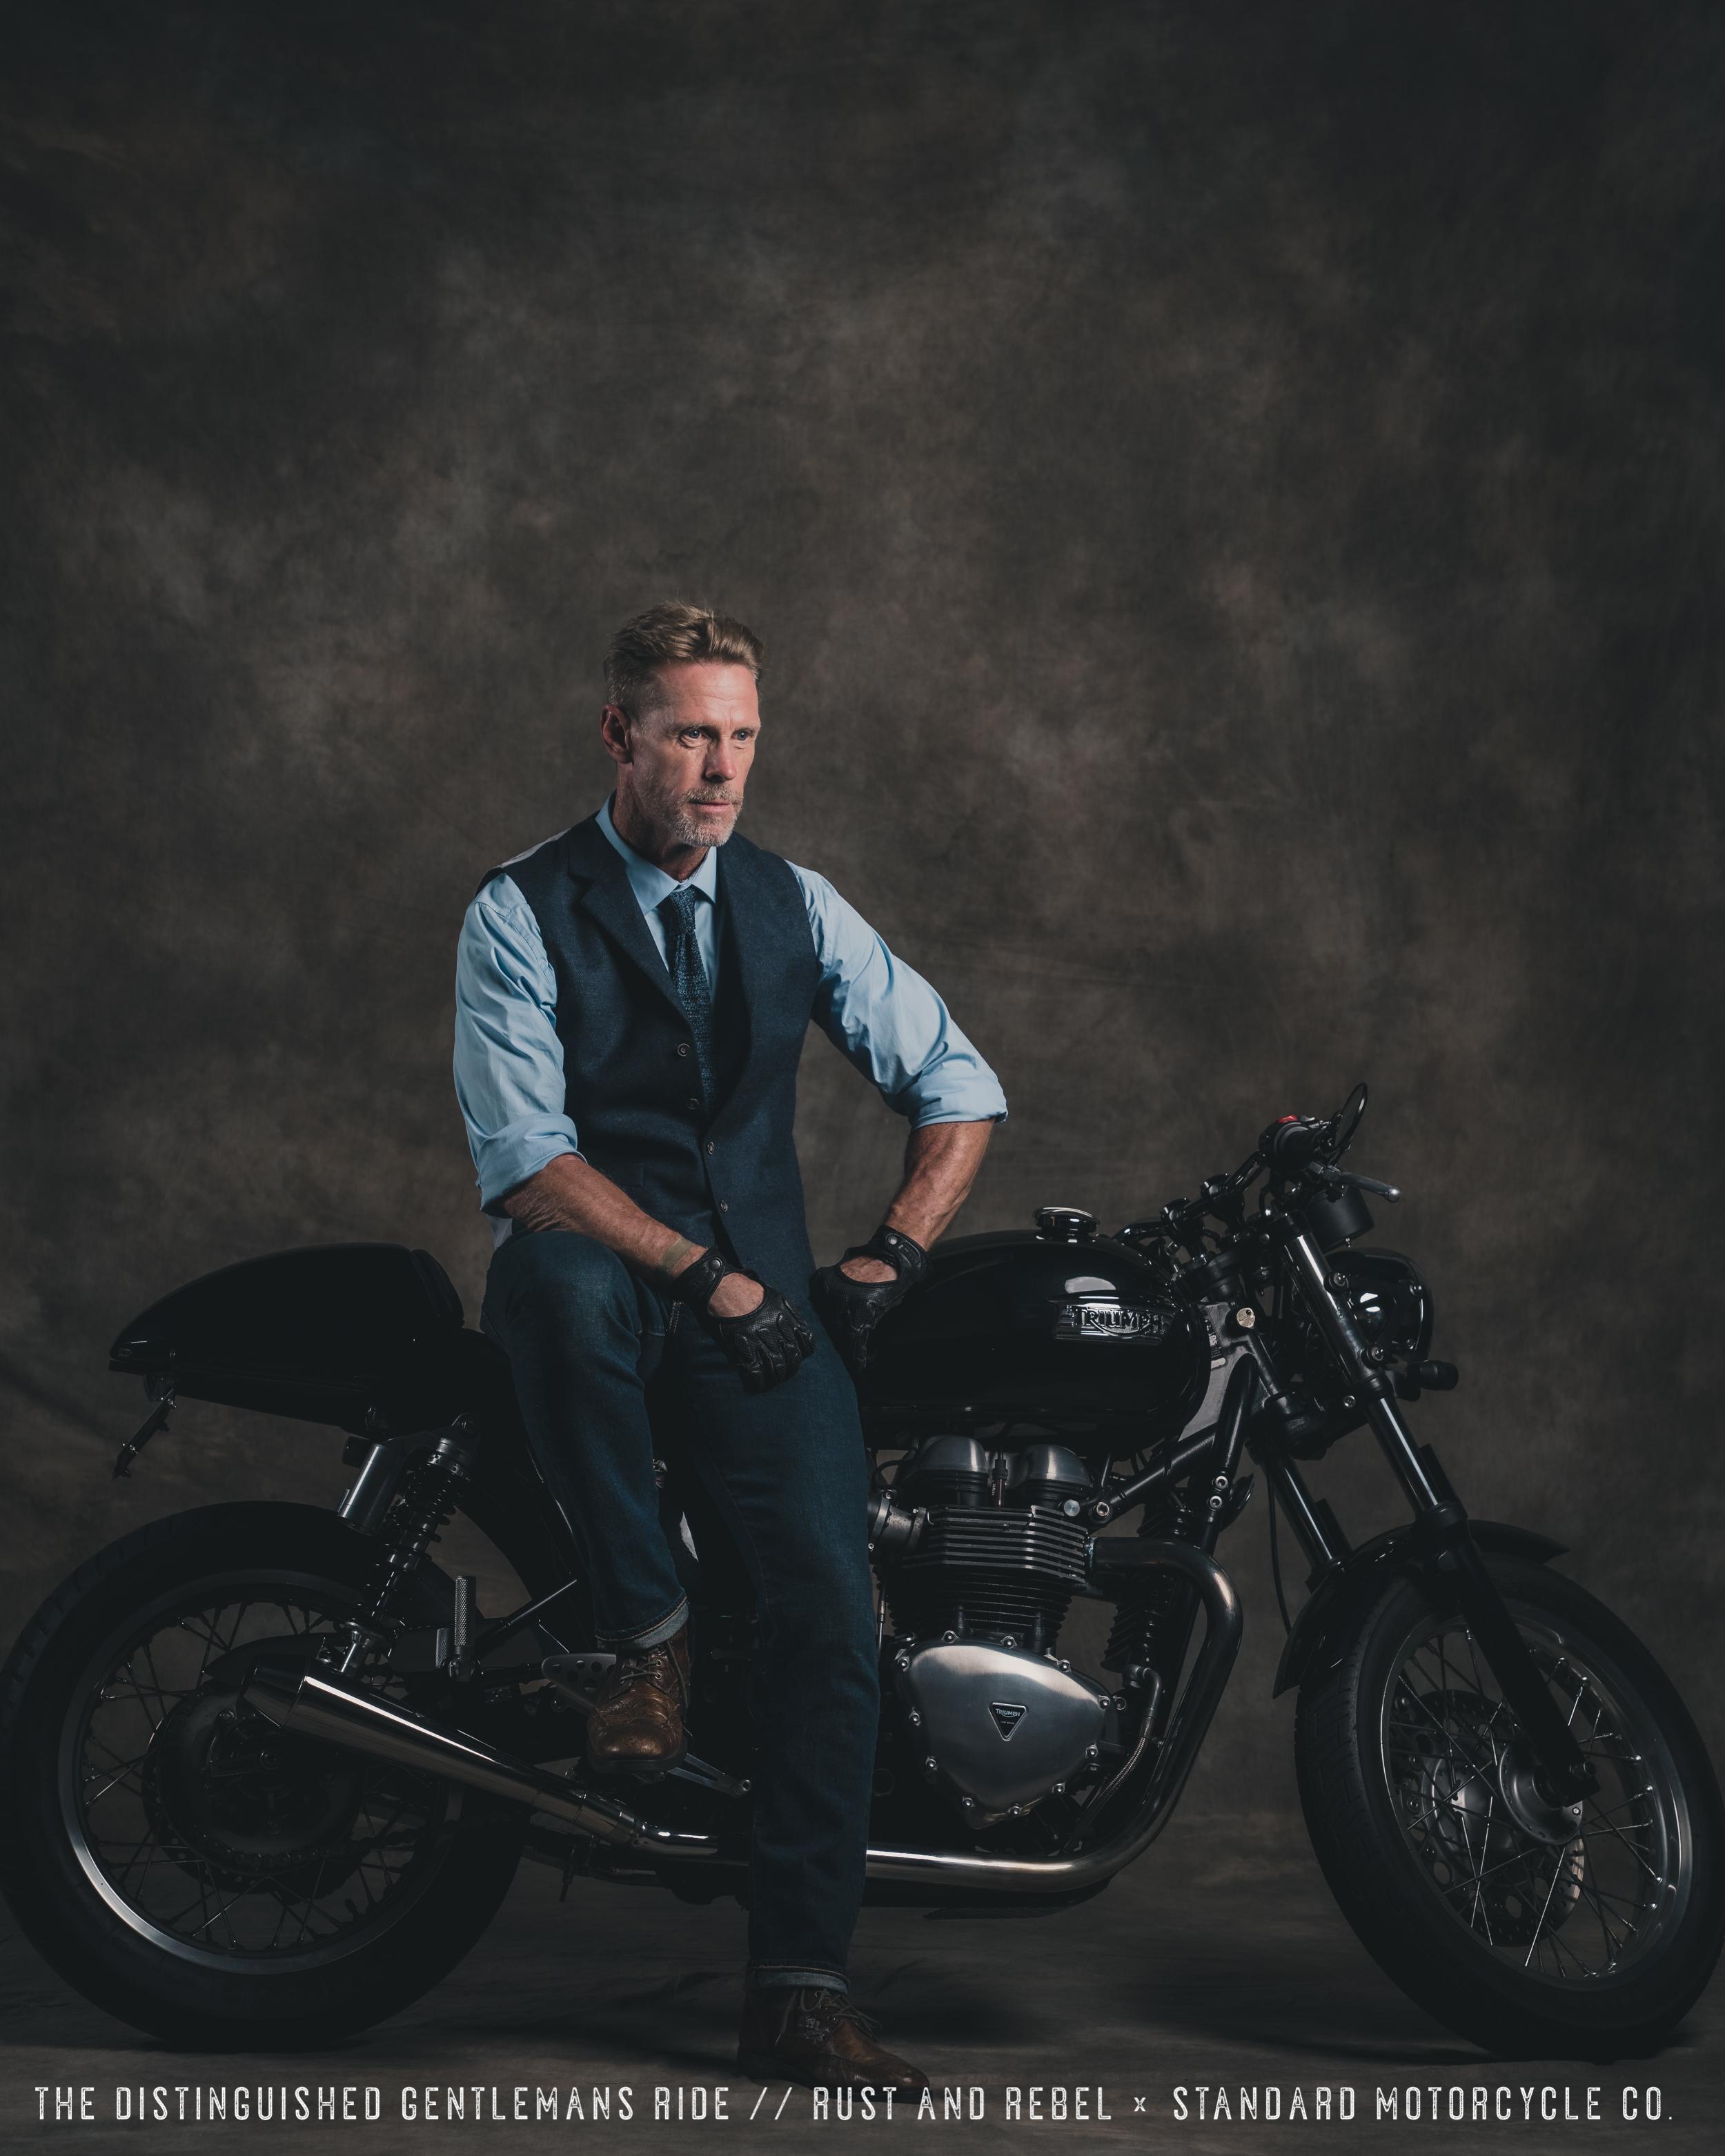 The Distinguished Gentleman's Ride 2019 [PEOPLE - PHOTO BY @MIKEDUNNUSA] - 0174.jpg